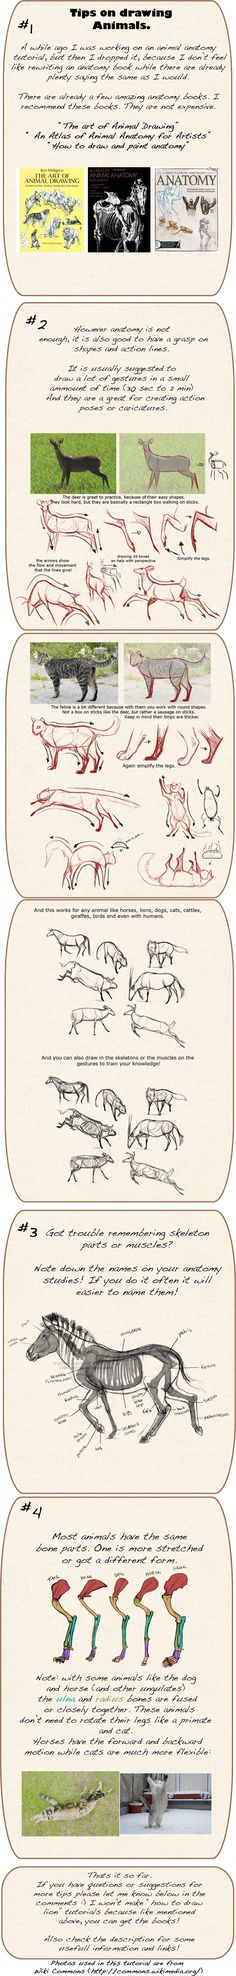 Tips on drawing animals ✤    CHARACTER DESIGN REFERENCES   解剖 • علم التشريح • анатомия • 解剖学 • anatómia • एनाटॉमी • ανατομία • 해부 • Find more at https://www.facebook.com/CharacterDesignReferences & http://www.pinterest.com/characterdesigh if you're looking for: #anatomy #anatomie #anatomia #anatomía #anatomya #anatomija #anatoomia #anatomi #anatomija #animal #creature    ✤ drawing animals, design refer, dragon anatomy, charact design, art tutori, draw anim, character design